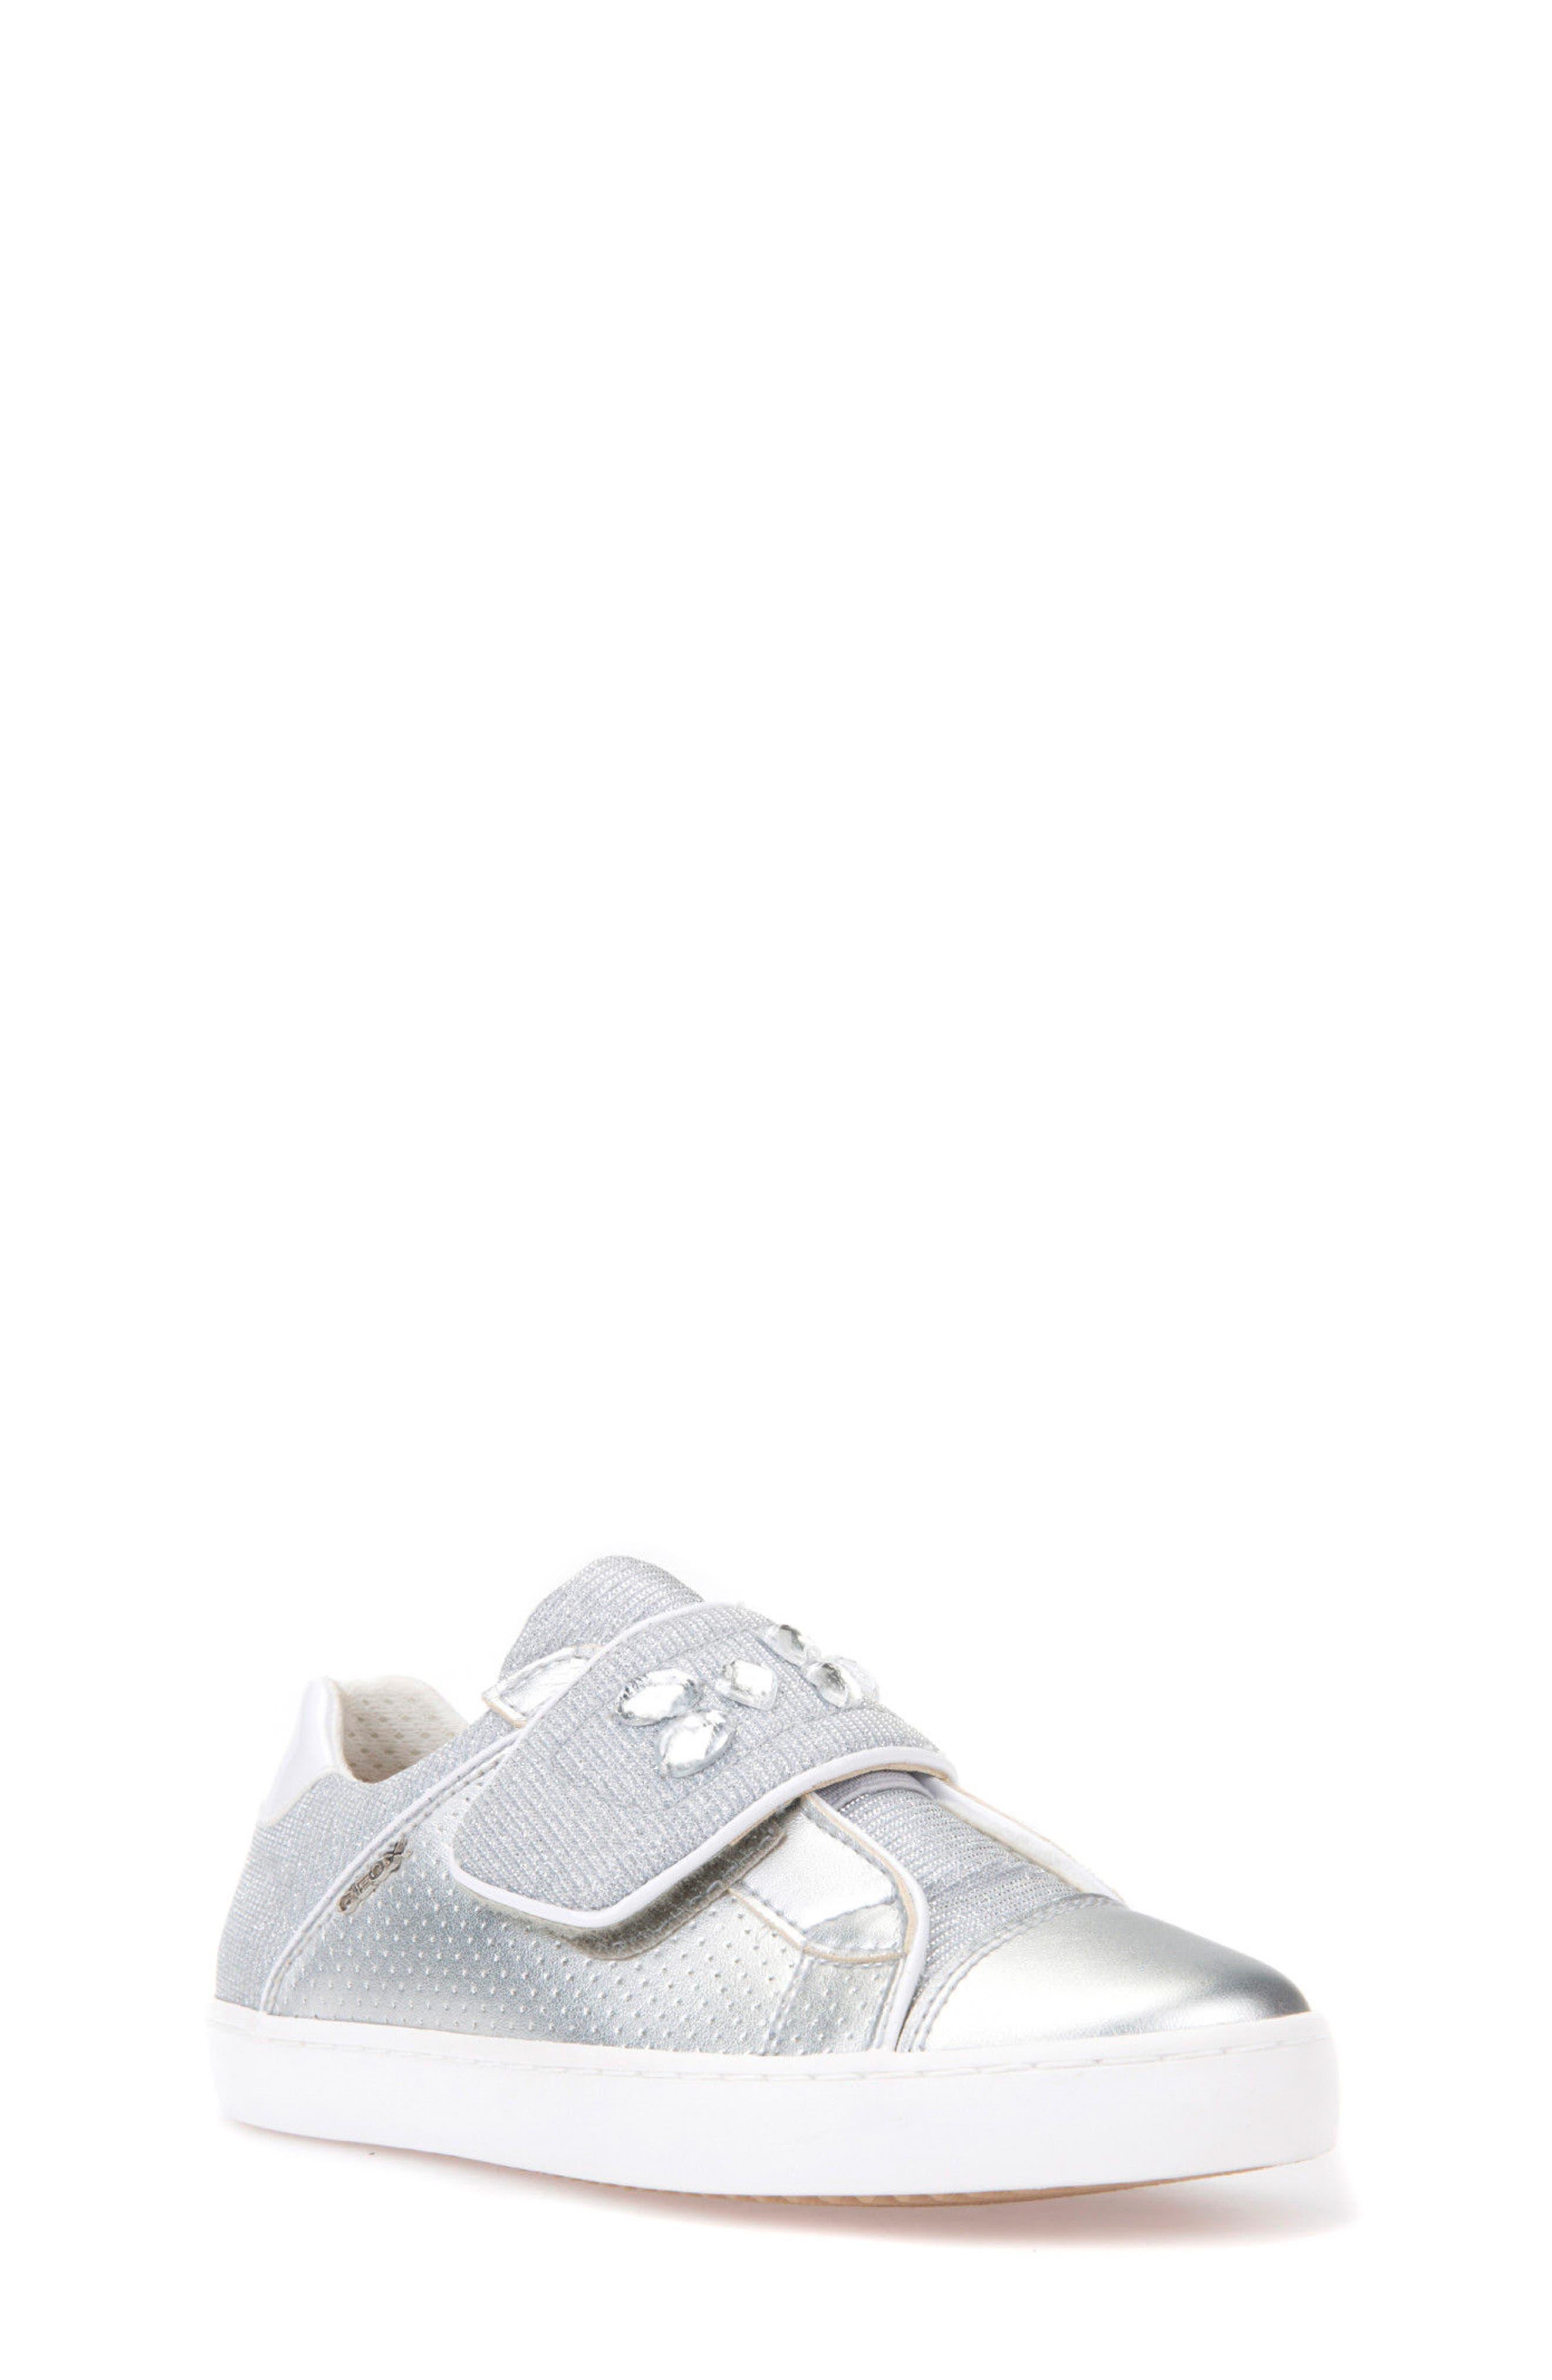 Kilwi Metallic Embellished Sneaker,                             Main thumbnail 1, color,                             SILVER